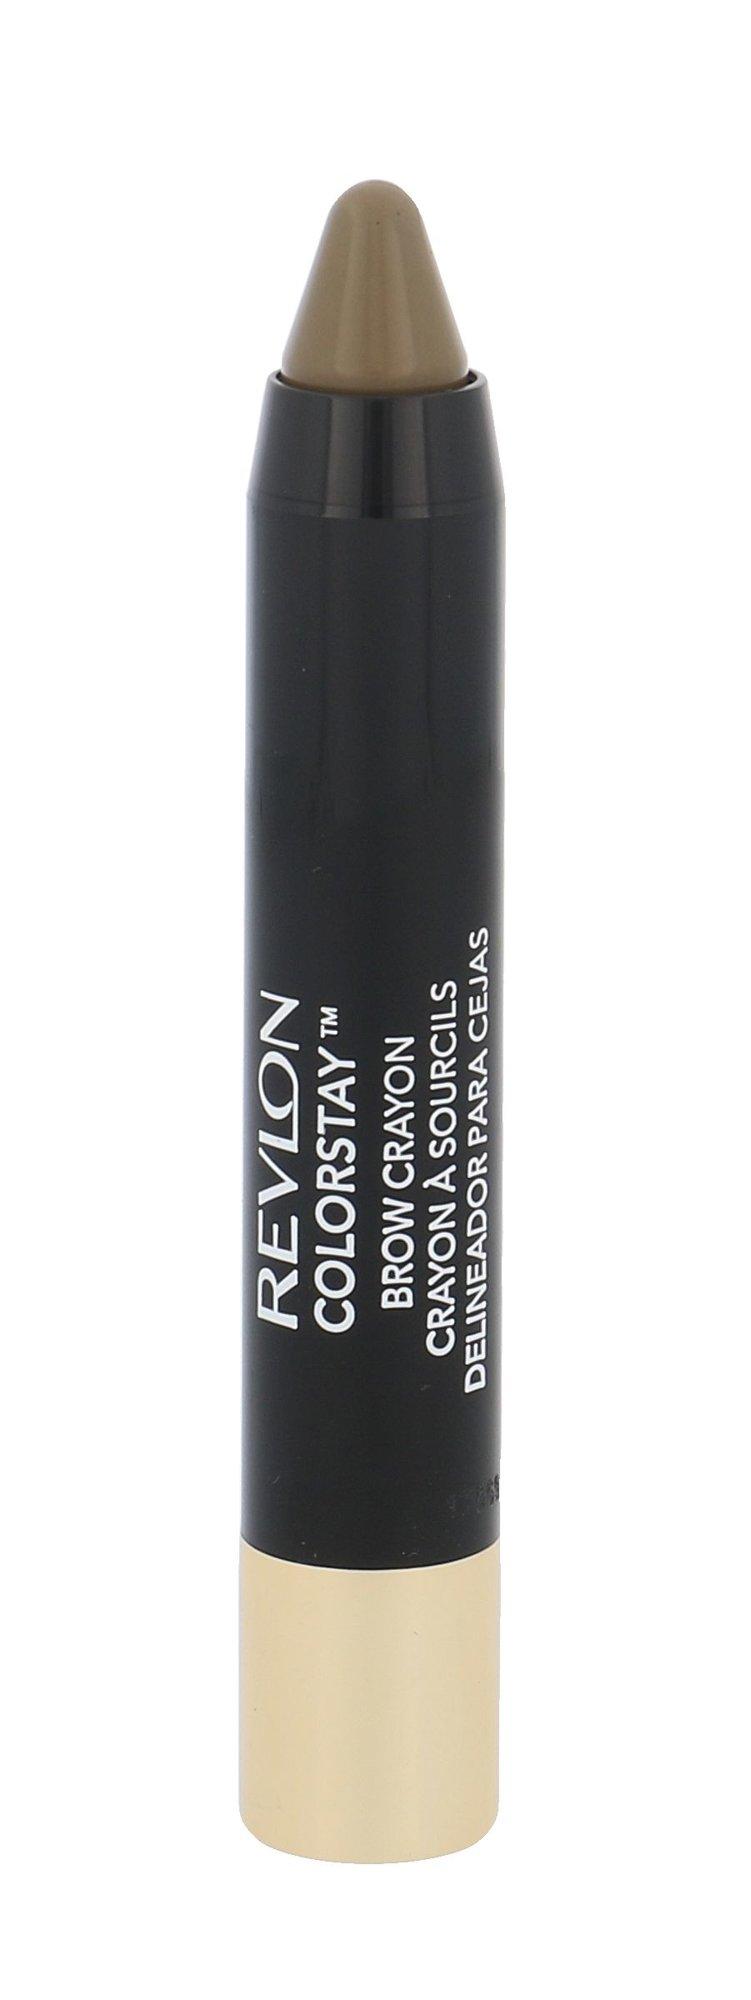 Revlon Colorstay Cosmetic 2,6ml 305 Blonde